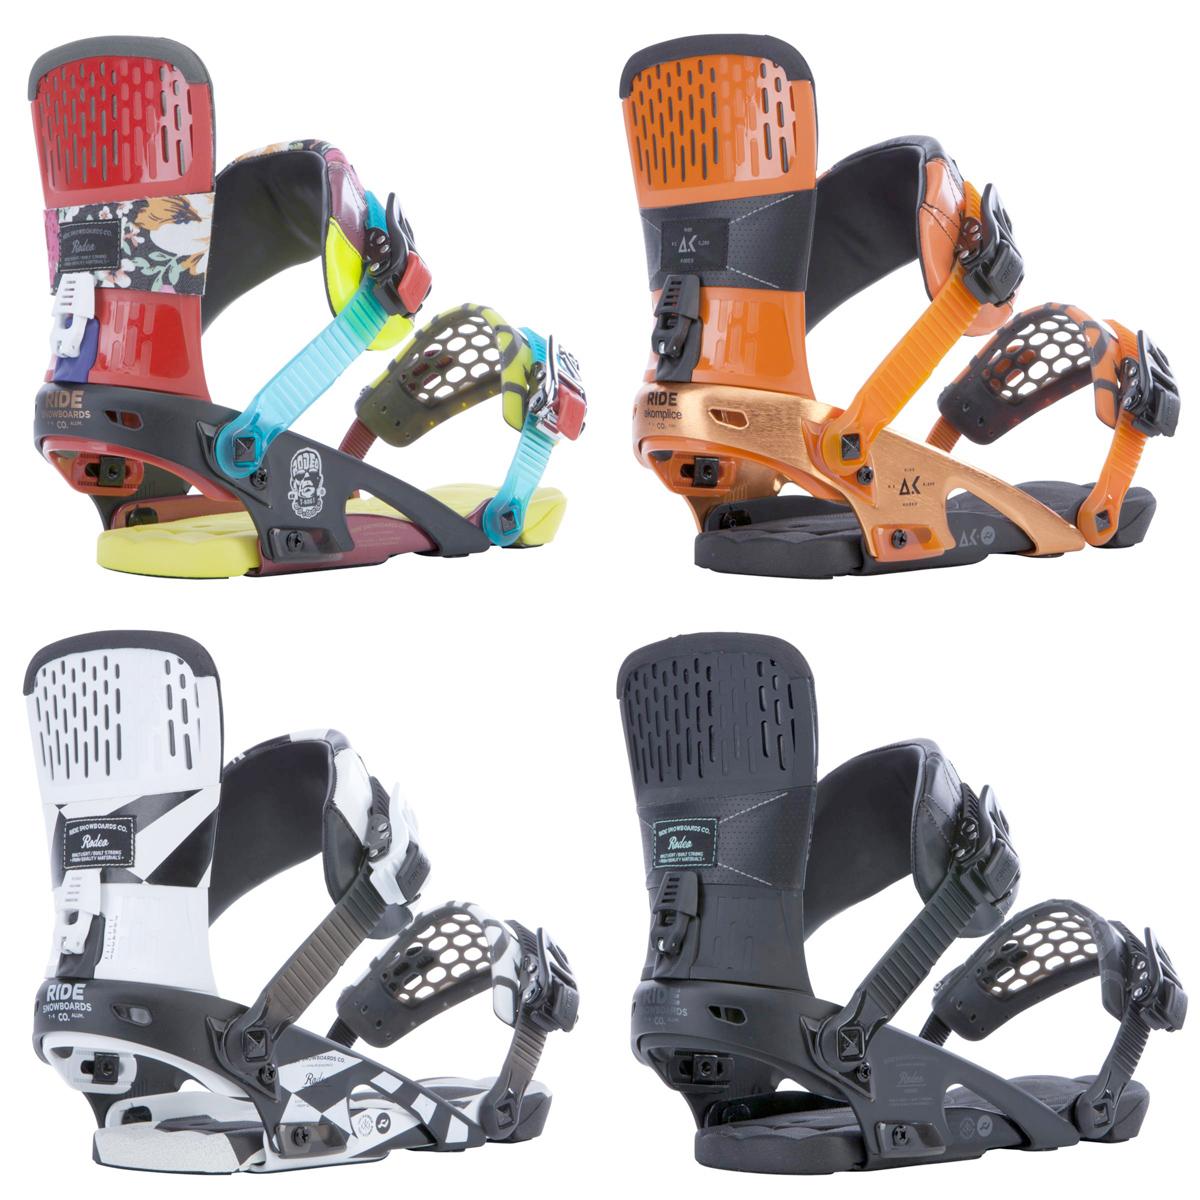 Ride Snowboard Bindings